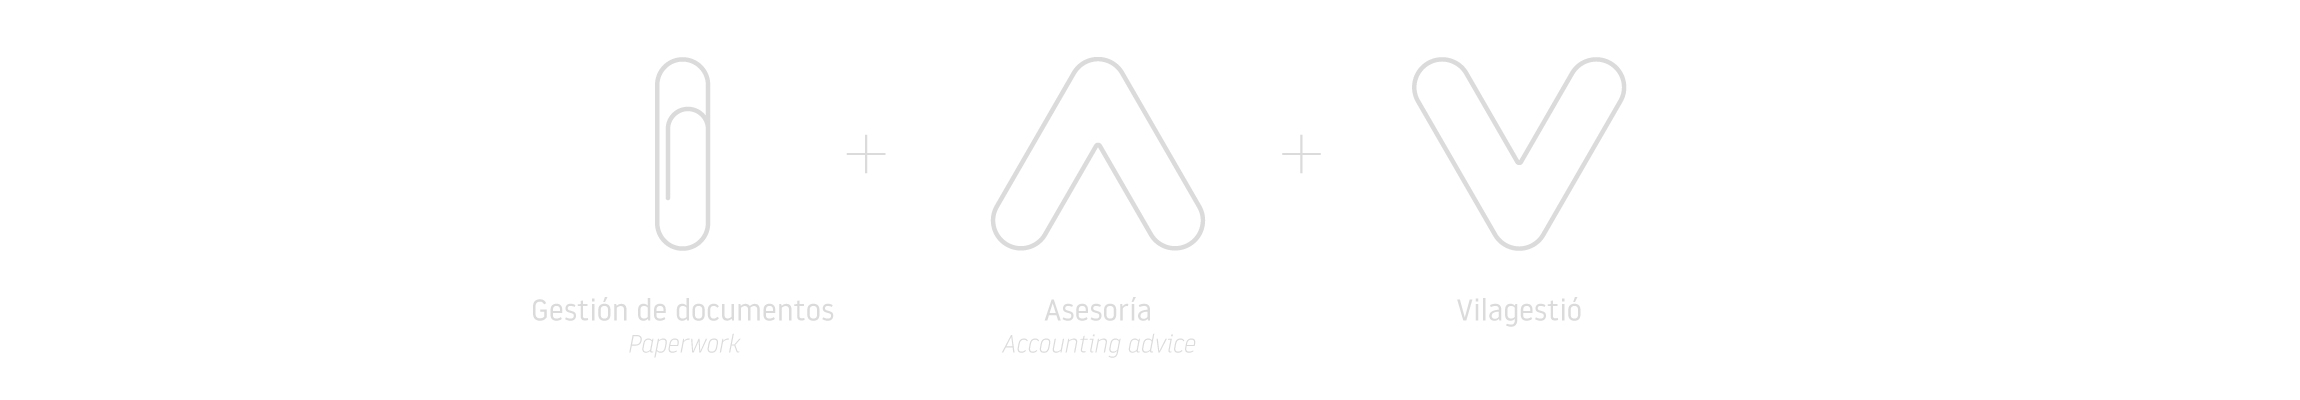 vilagestio_1-logoconcept